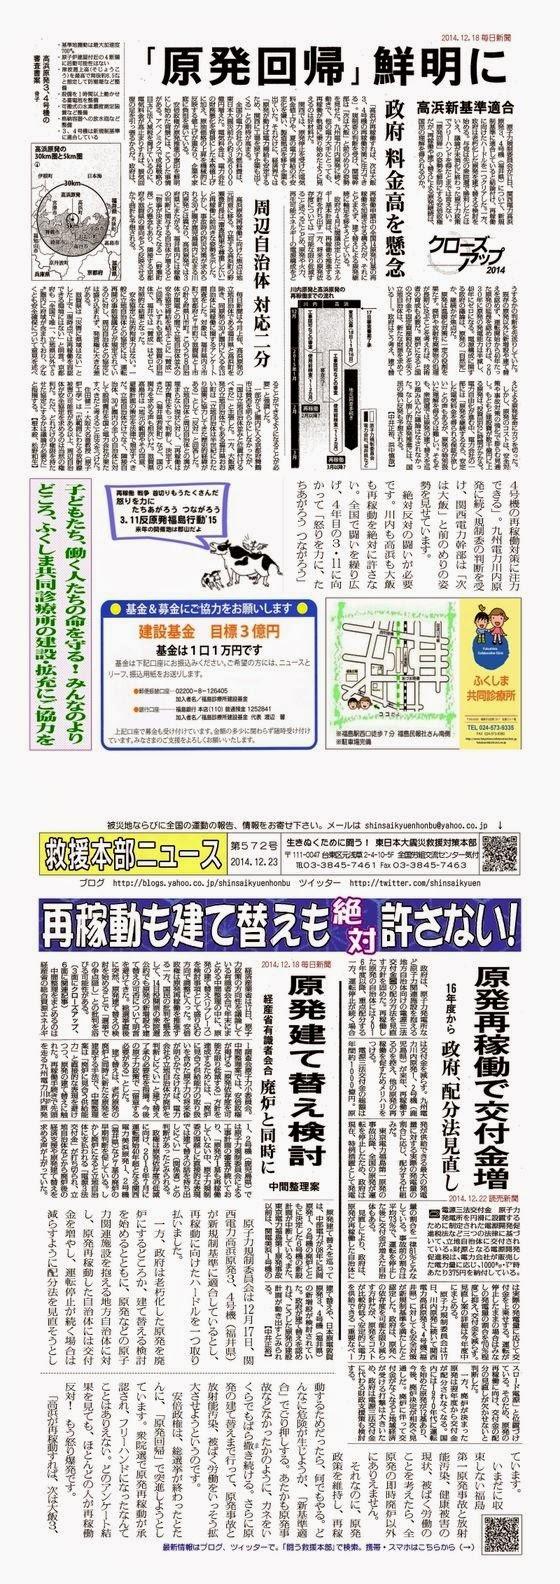 http://www.geocities.jp/shinsaikyuenhonbu/honbu572.pdf